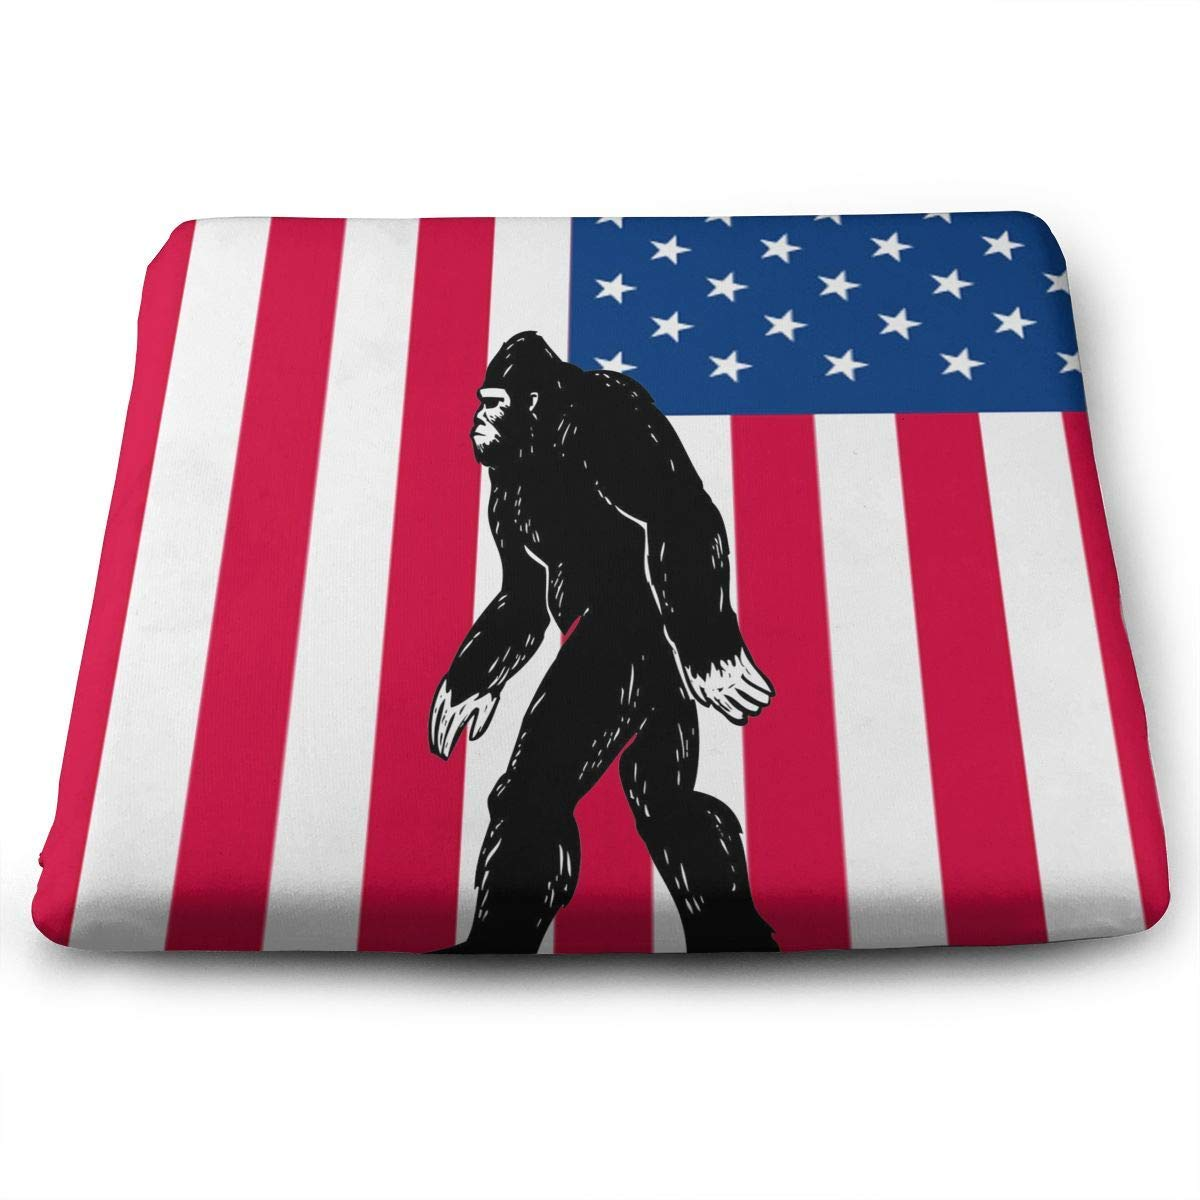 Bigfoot America Flag,Home Office Decoration Square Seat Chair Pad Fashion Seat Cushion